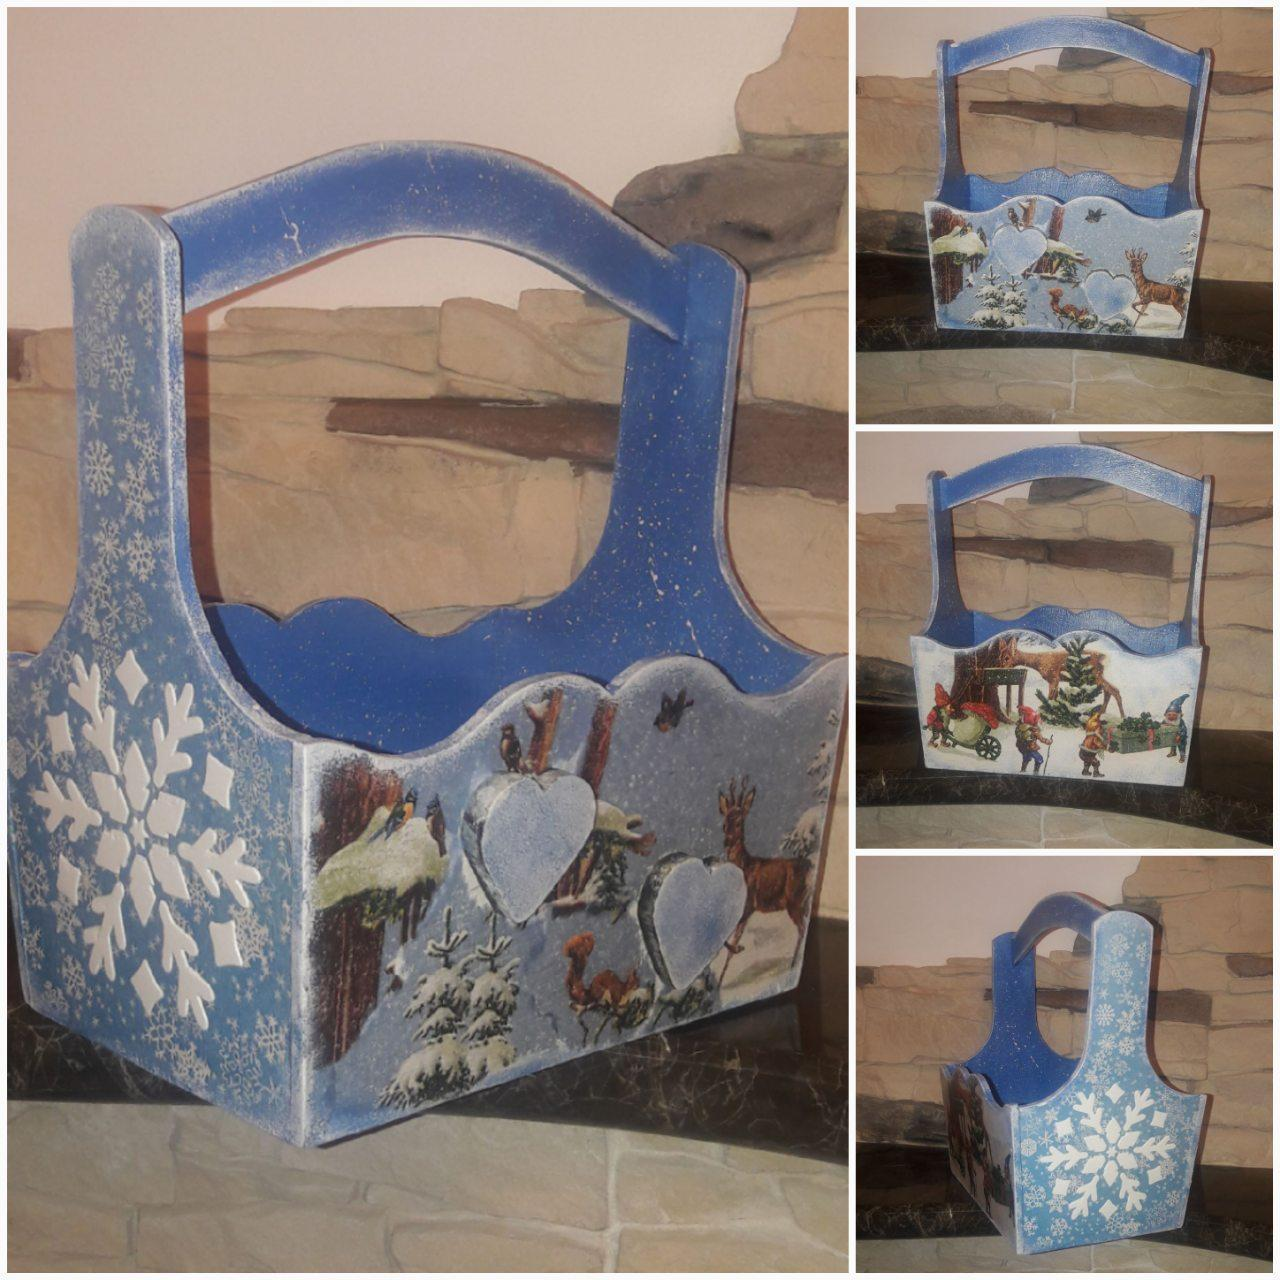 Красивый ящик к Новому году, декупаж, дерево и фанера, 19х18х12см., 290/260 (цена за 1 шт. + 30 гр.)